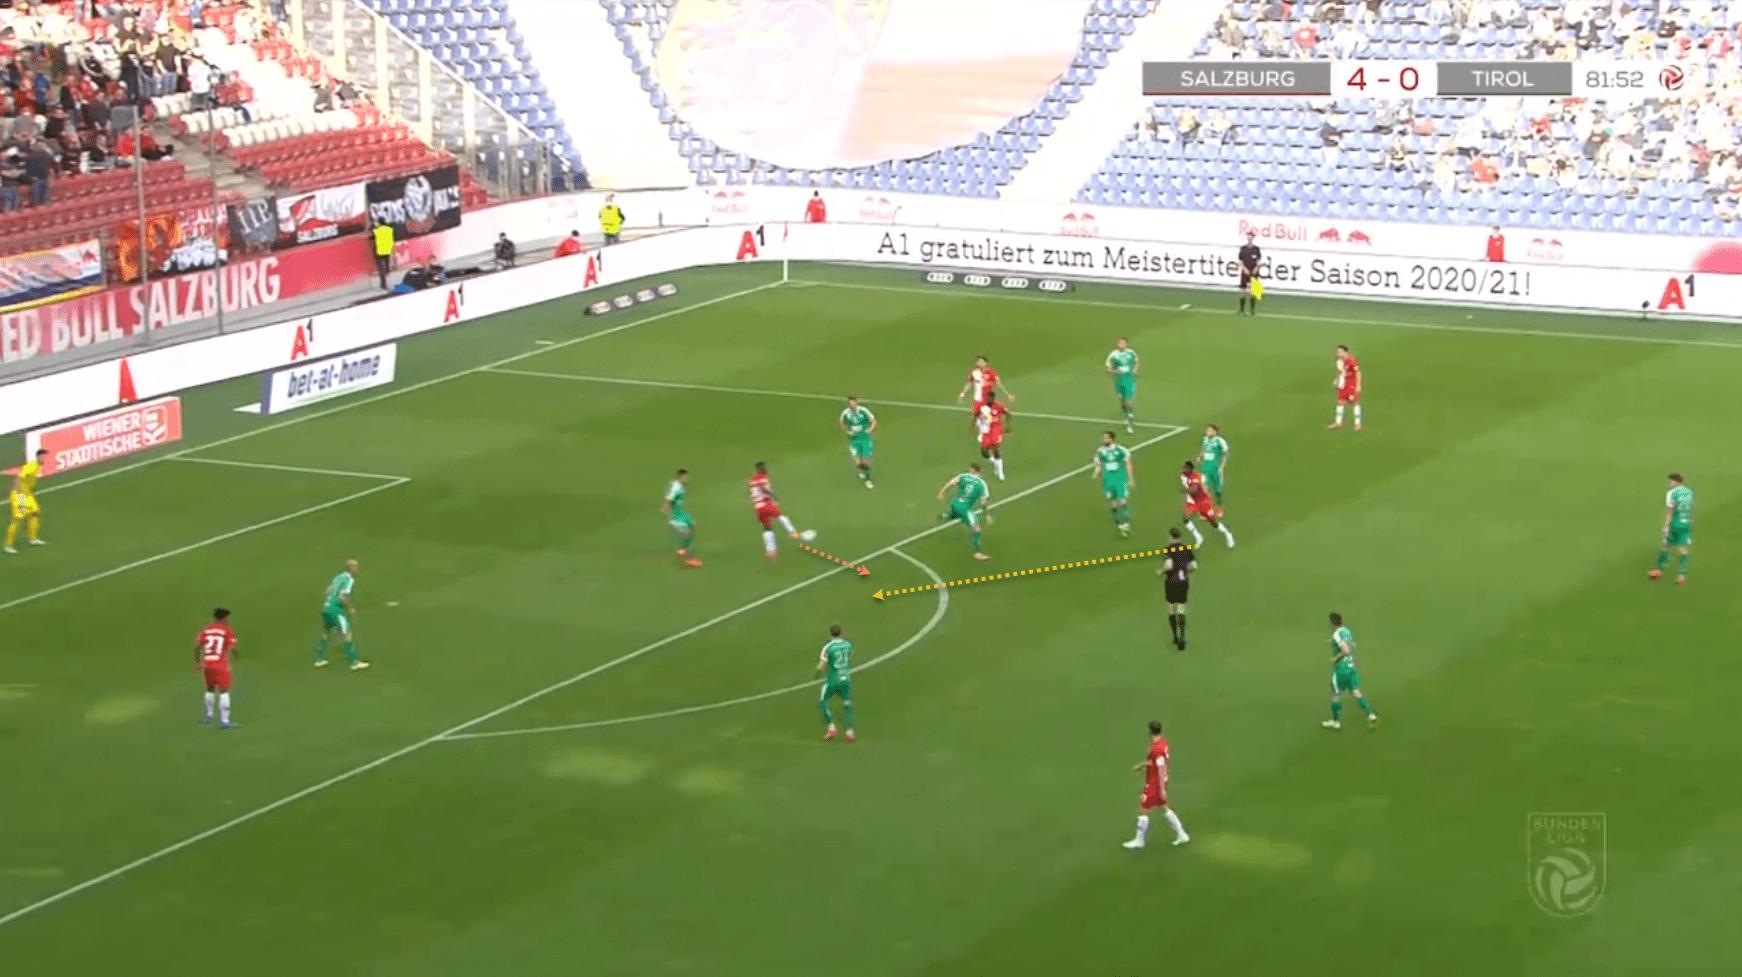 Patson Daka at Leicester City 2021/22 - scout report - tactical analysis - tactics